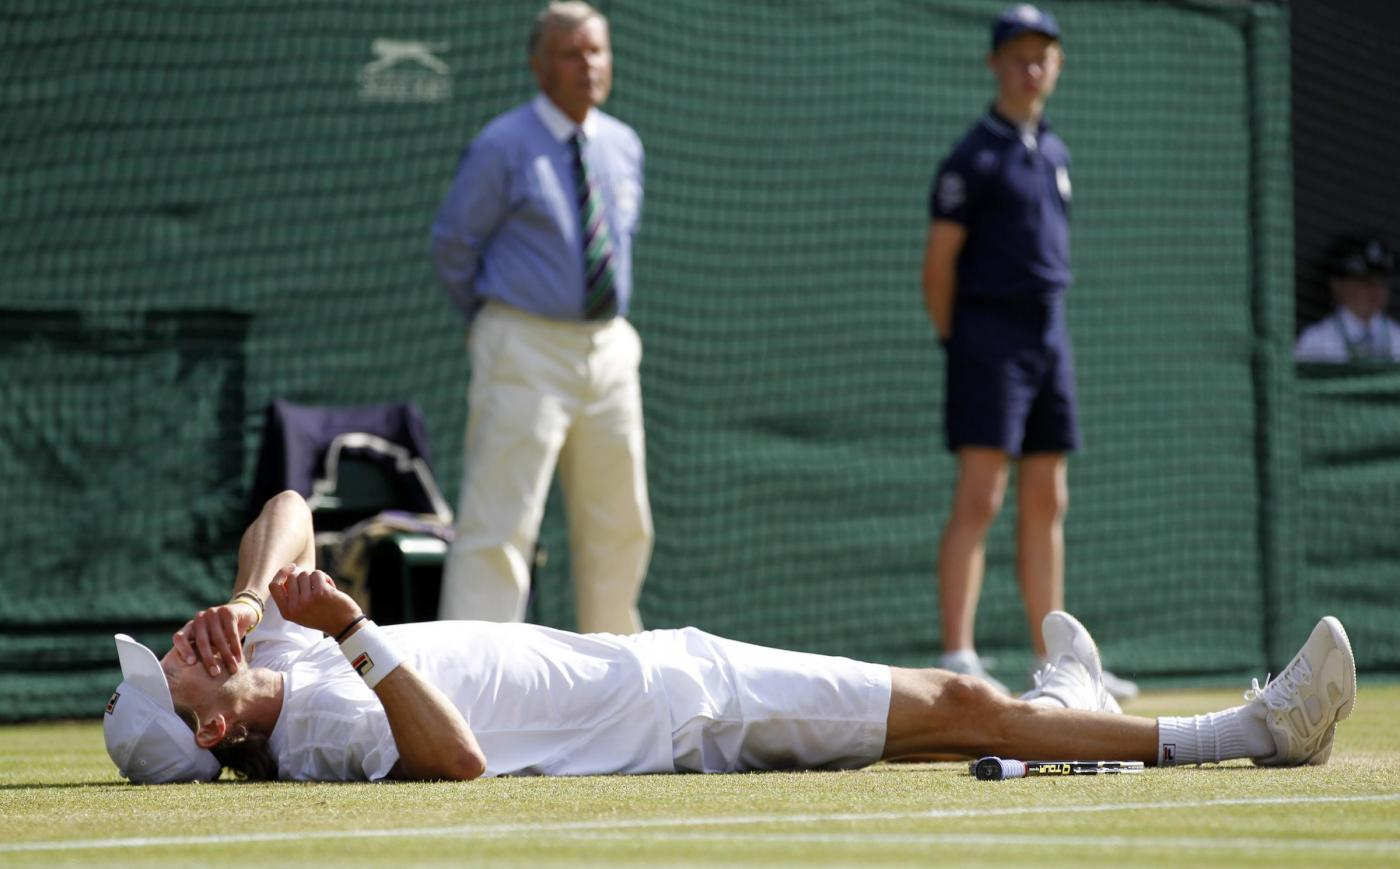 Wimbledon 2014 Seppi